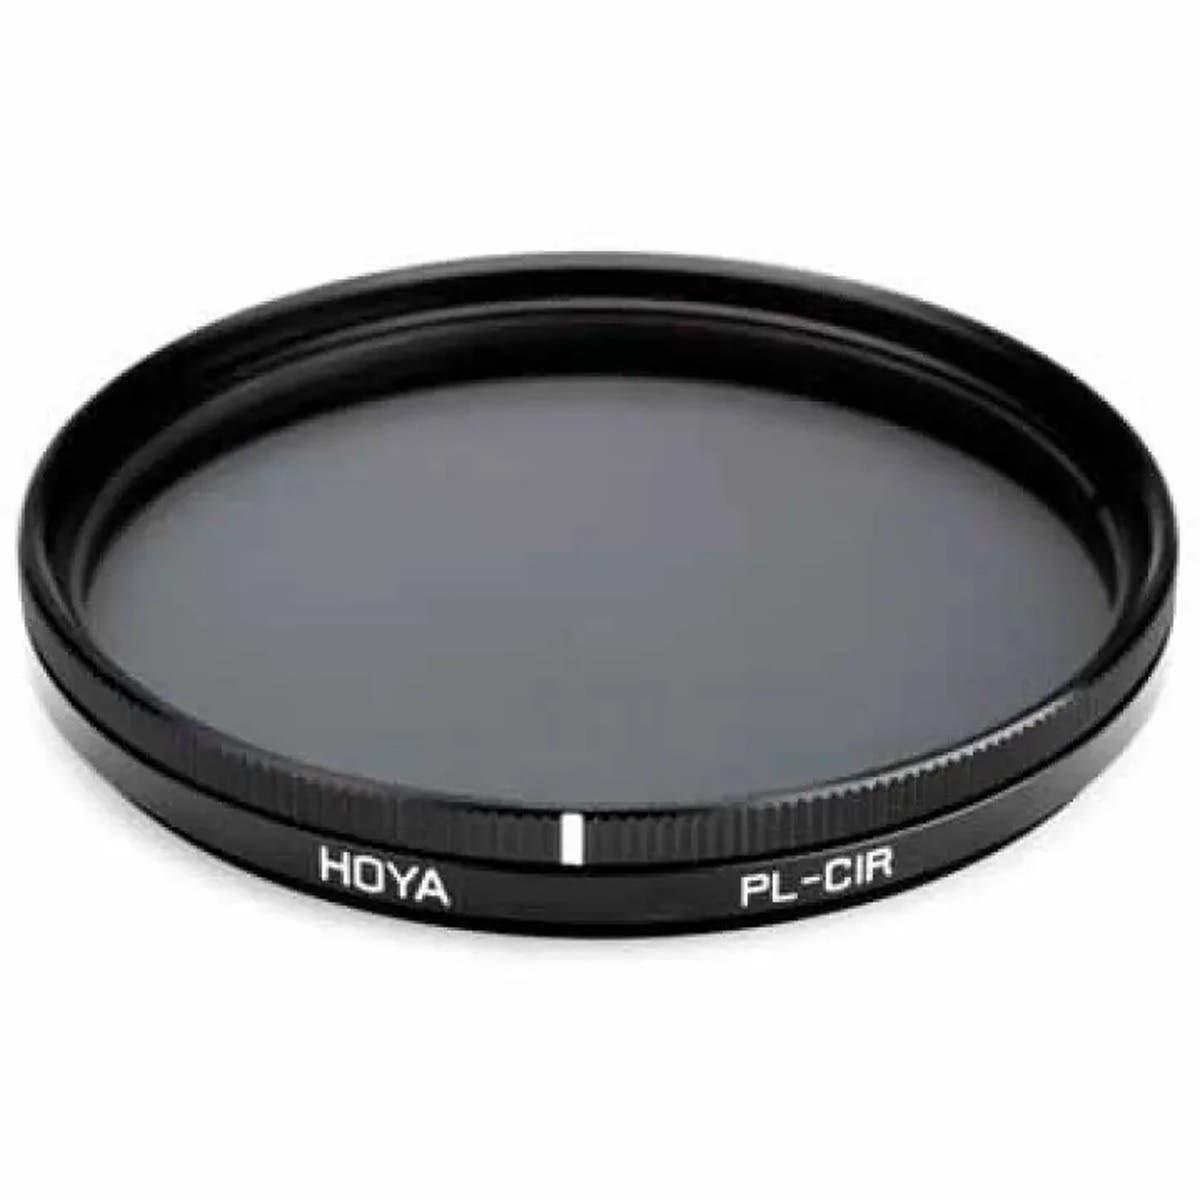 Hoya 52mm Circular-Polarising Filter